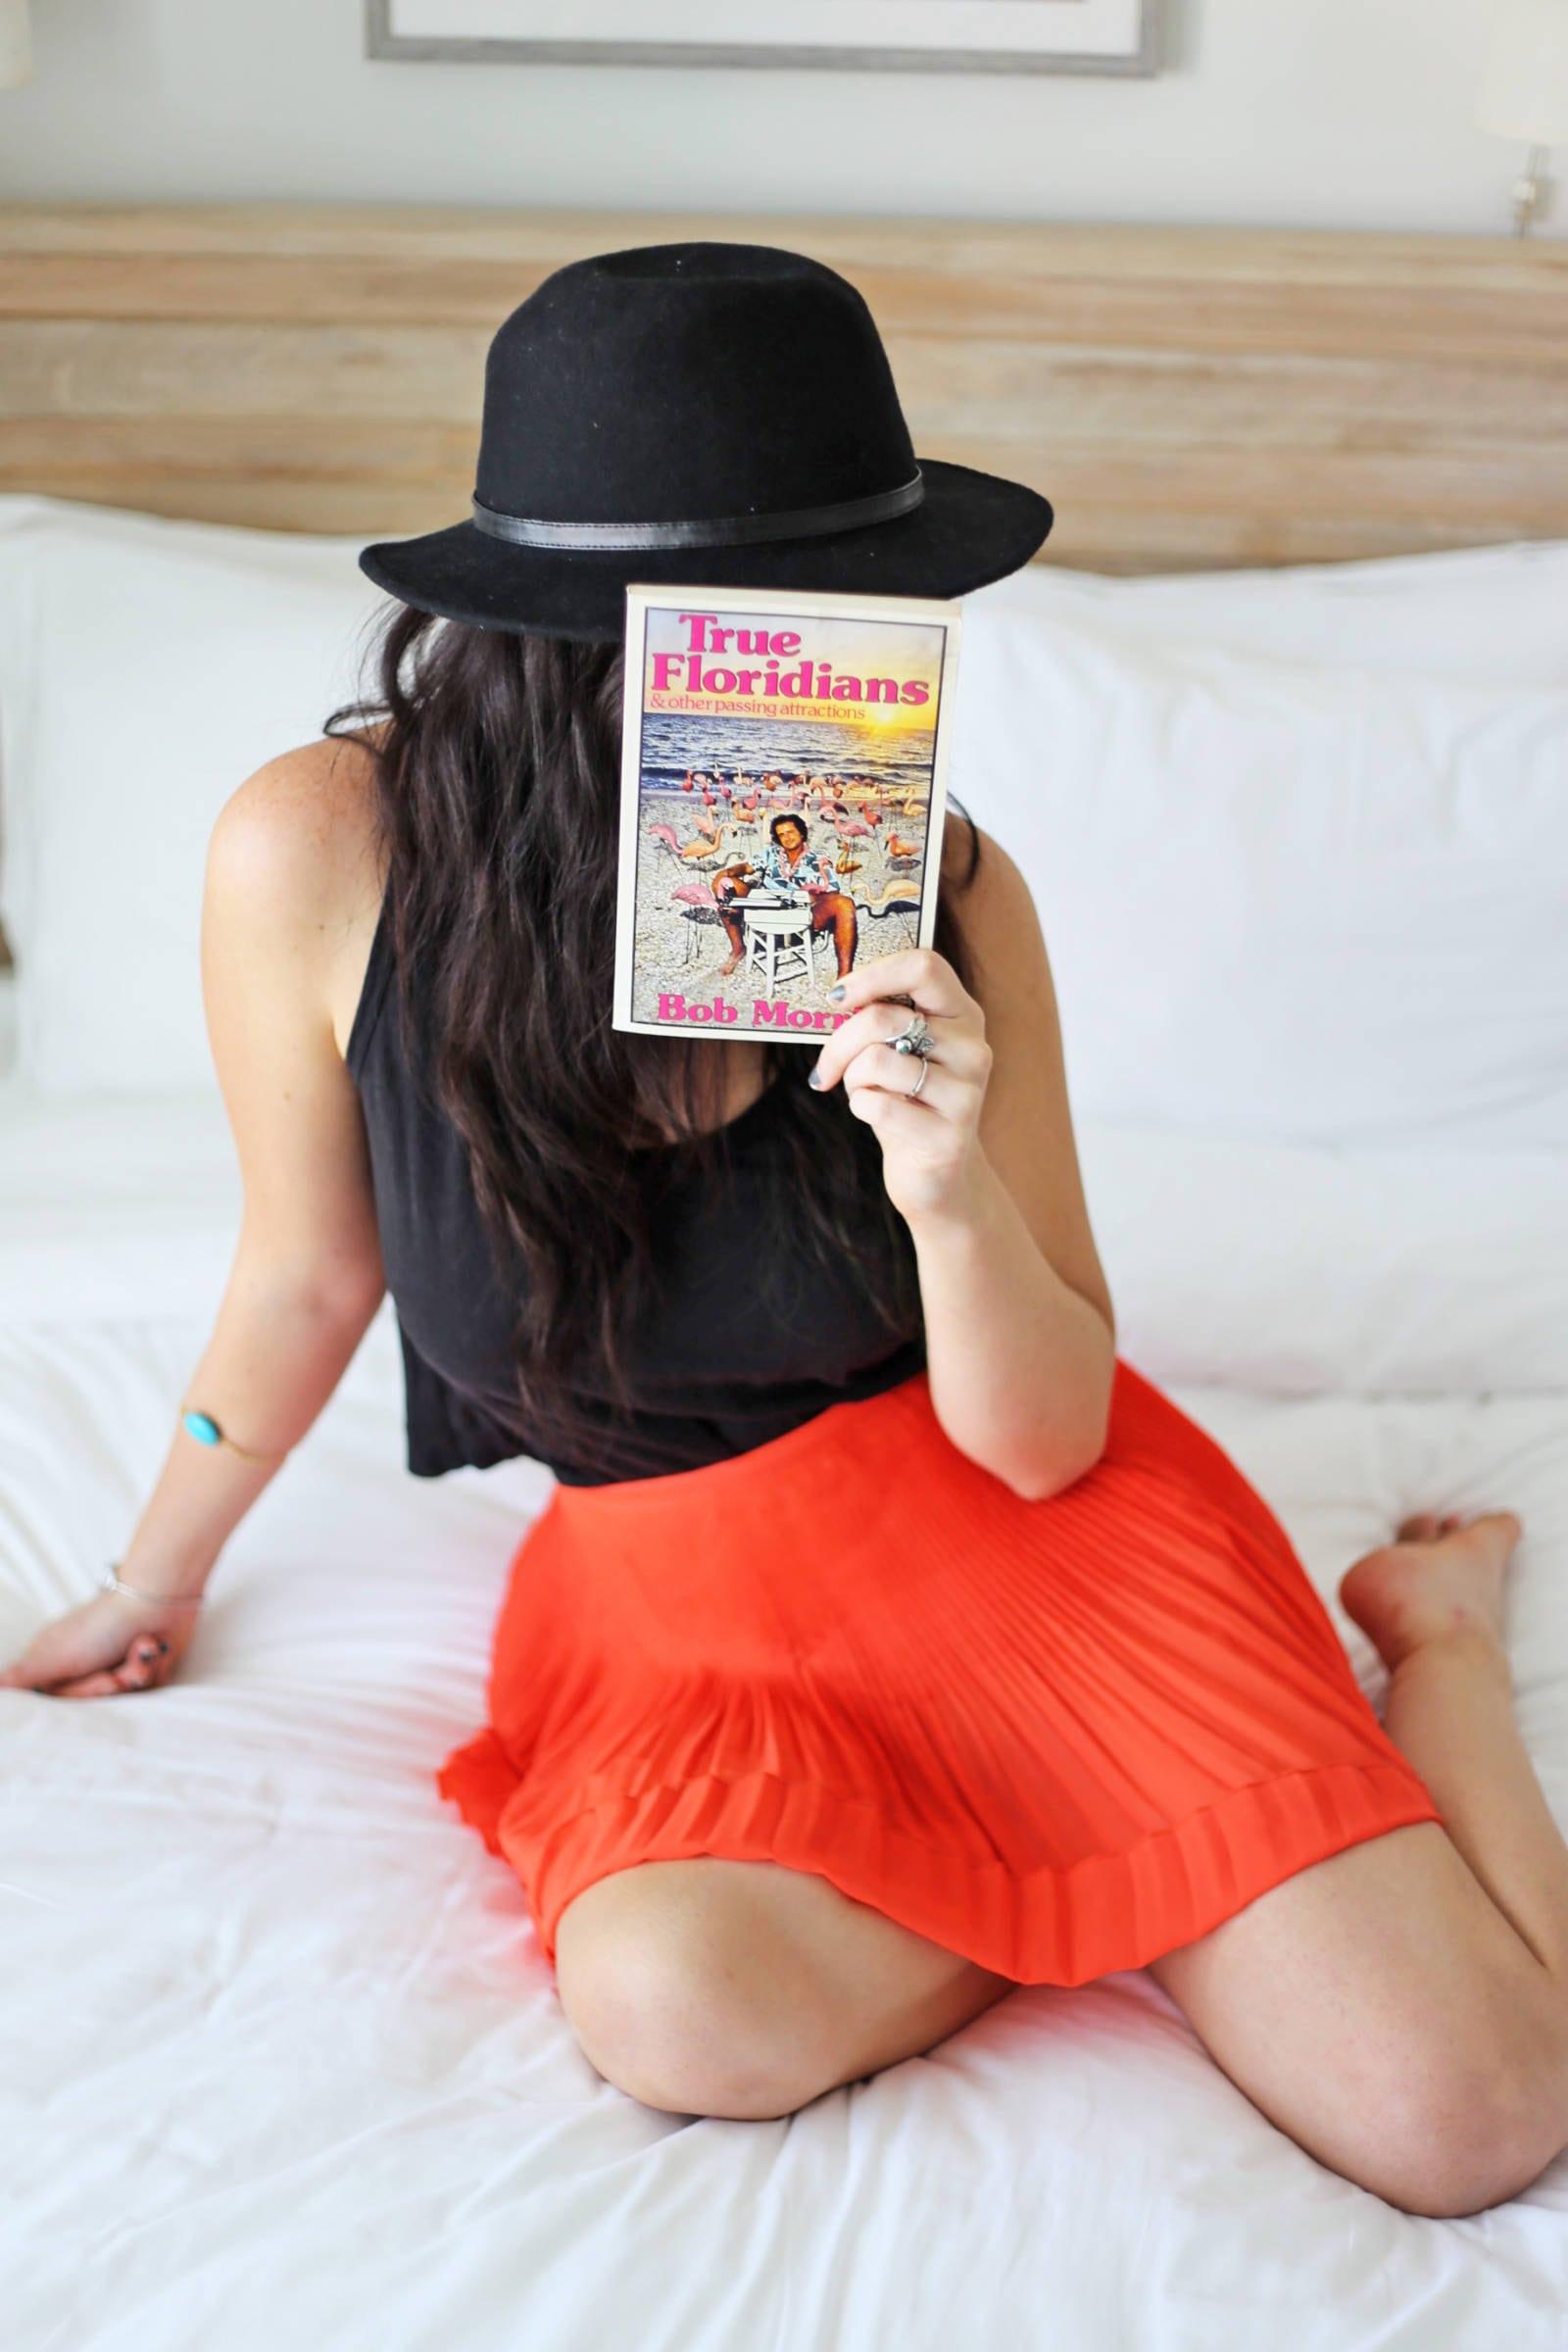 Mash Elle lifestyle blogger | St. pete beach | beauty blogger Mash Elle | black hat | plants | beach house black hat red skirt